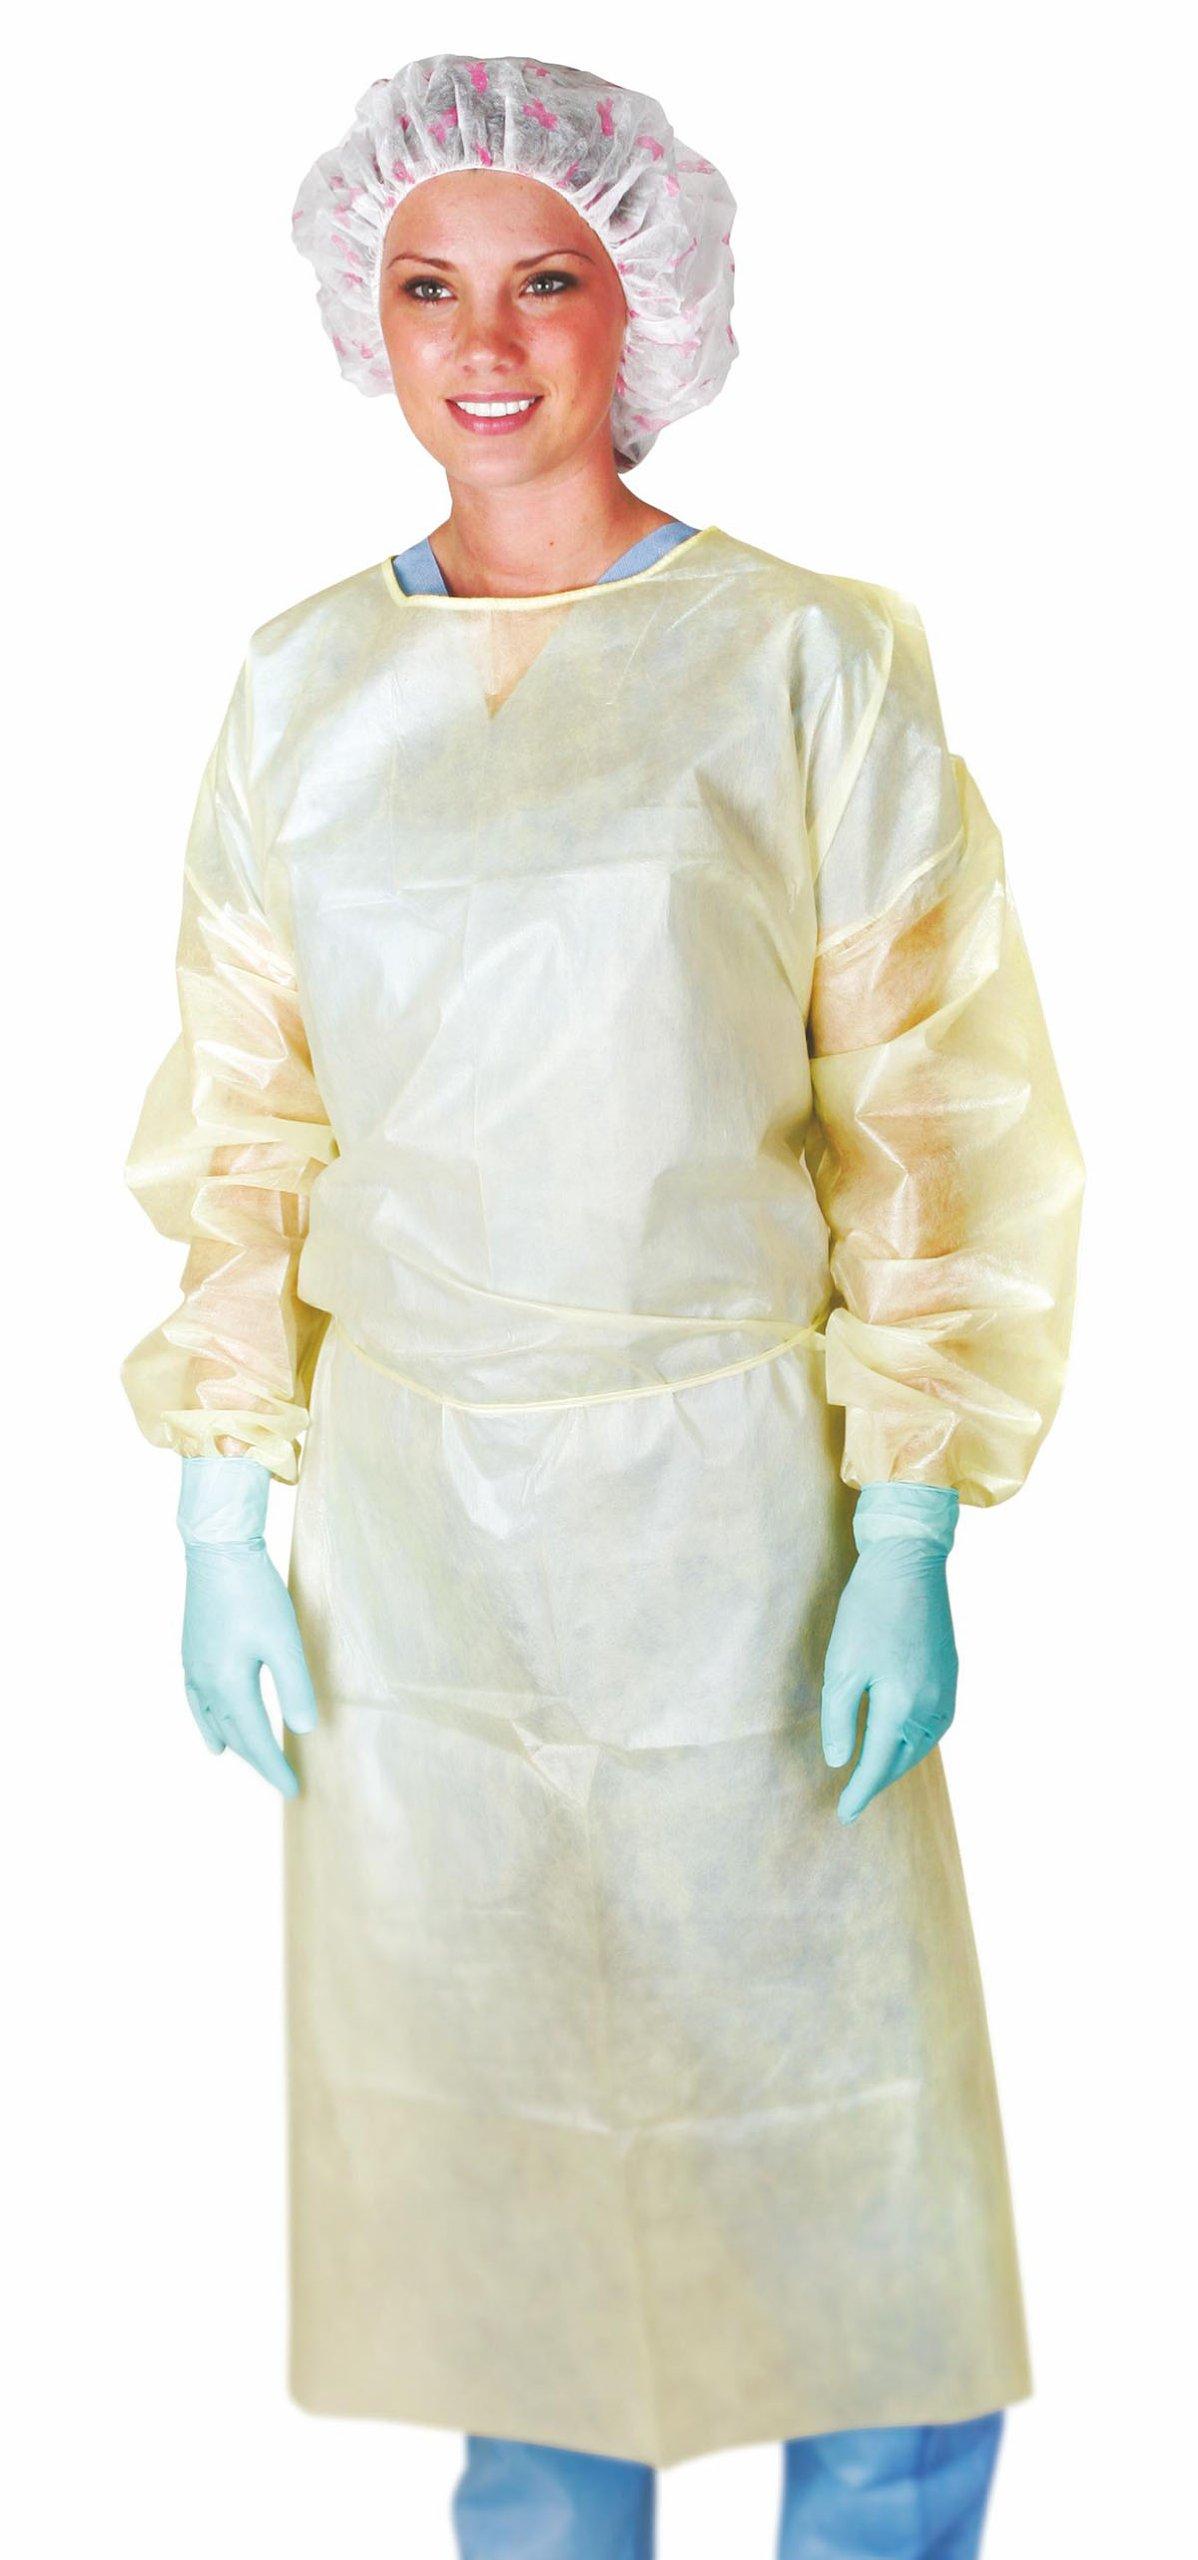 Medline CRI4011CF Medium-Weight Coated Polypropylene Isolation Gowns, X-Large, Yellow (Pack of 50)